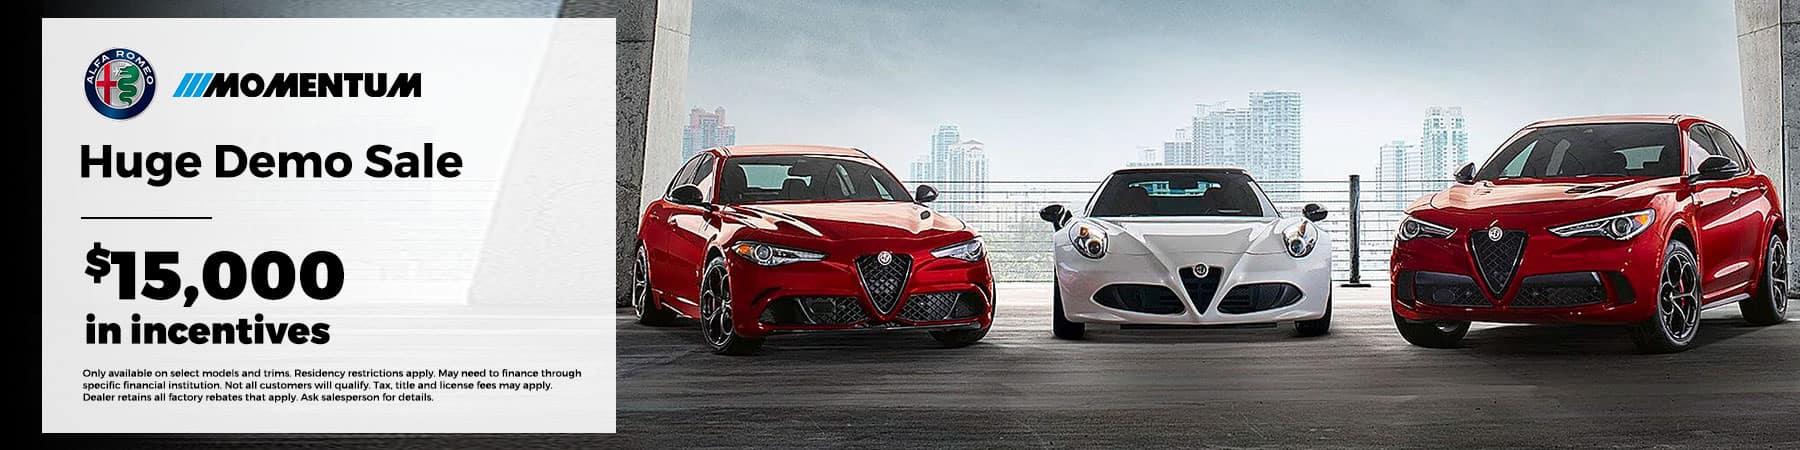 Huge Demo Sale - $15,000 in incentives! Only available on select models & trims; See dealer for complete details.